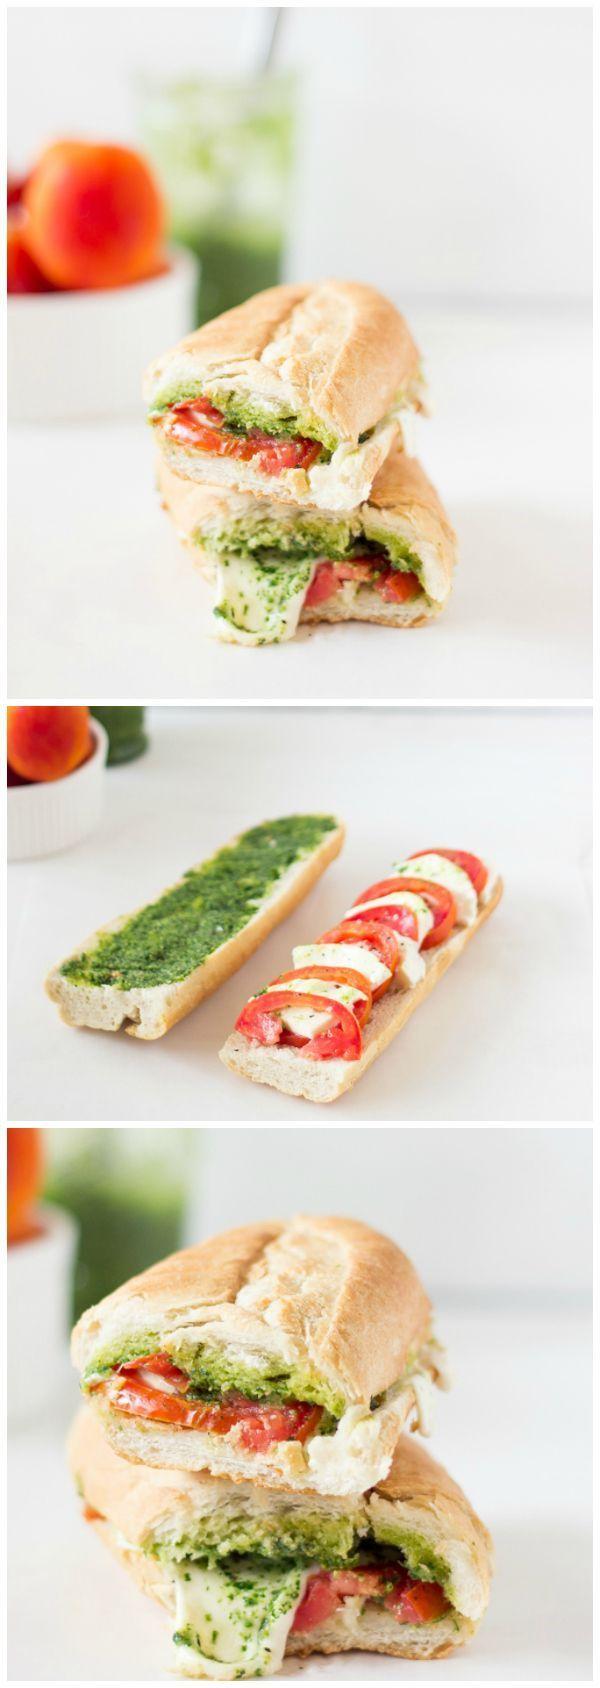 Caprese Sandwich: Er wird mit geschmolzenem Mozzarella geröstet und ... - #Caprese #Er #geröstet #geschmolzenem #mit #Mozzarella #Sandwich #und #wird #vegetariandish